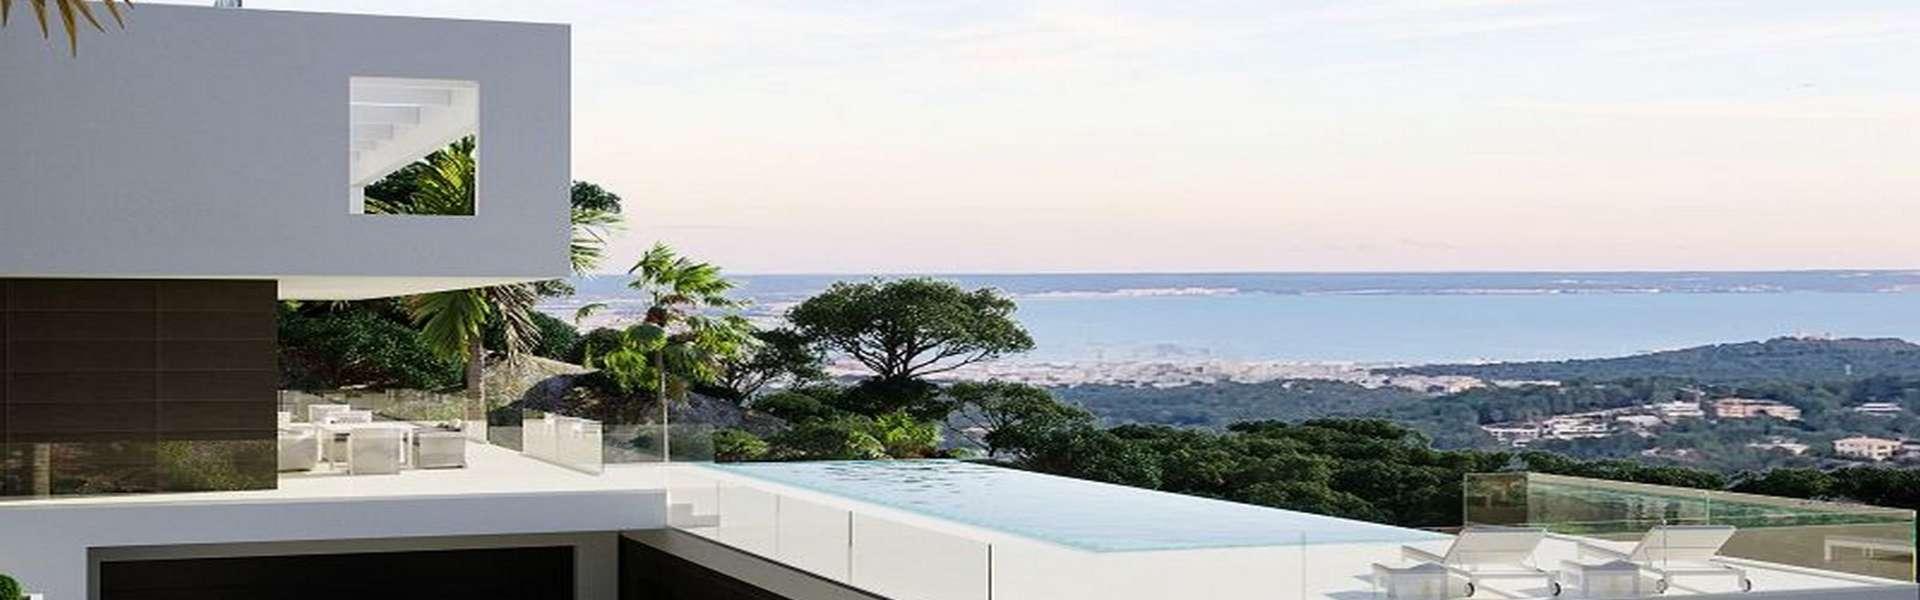 Palma/Son Vida - Designervilla mit Panoramameerblick